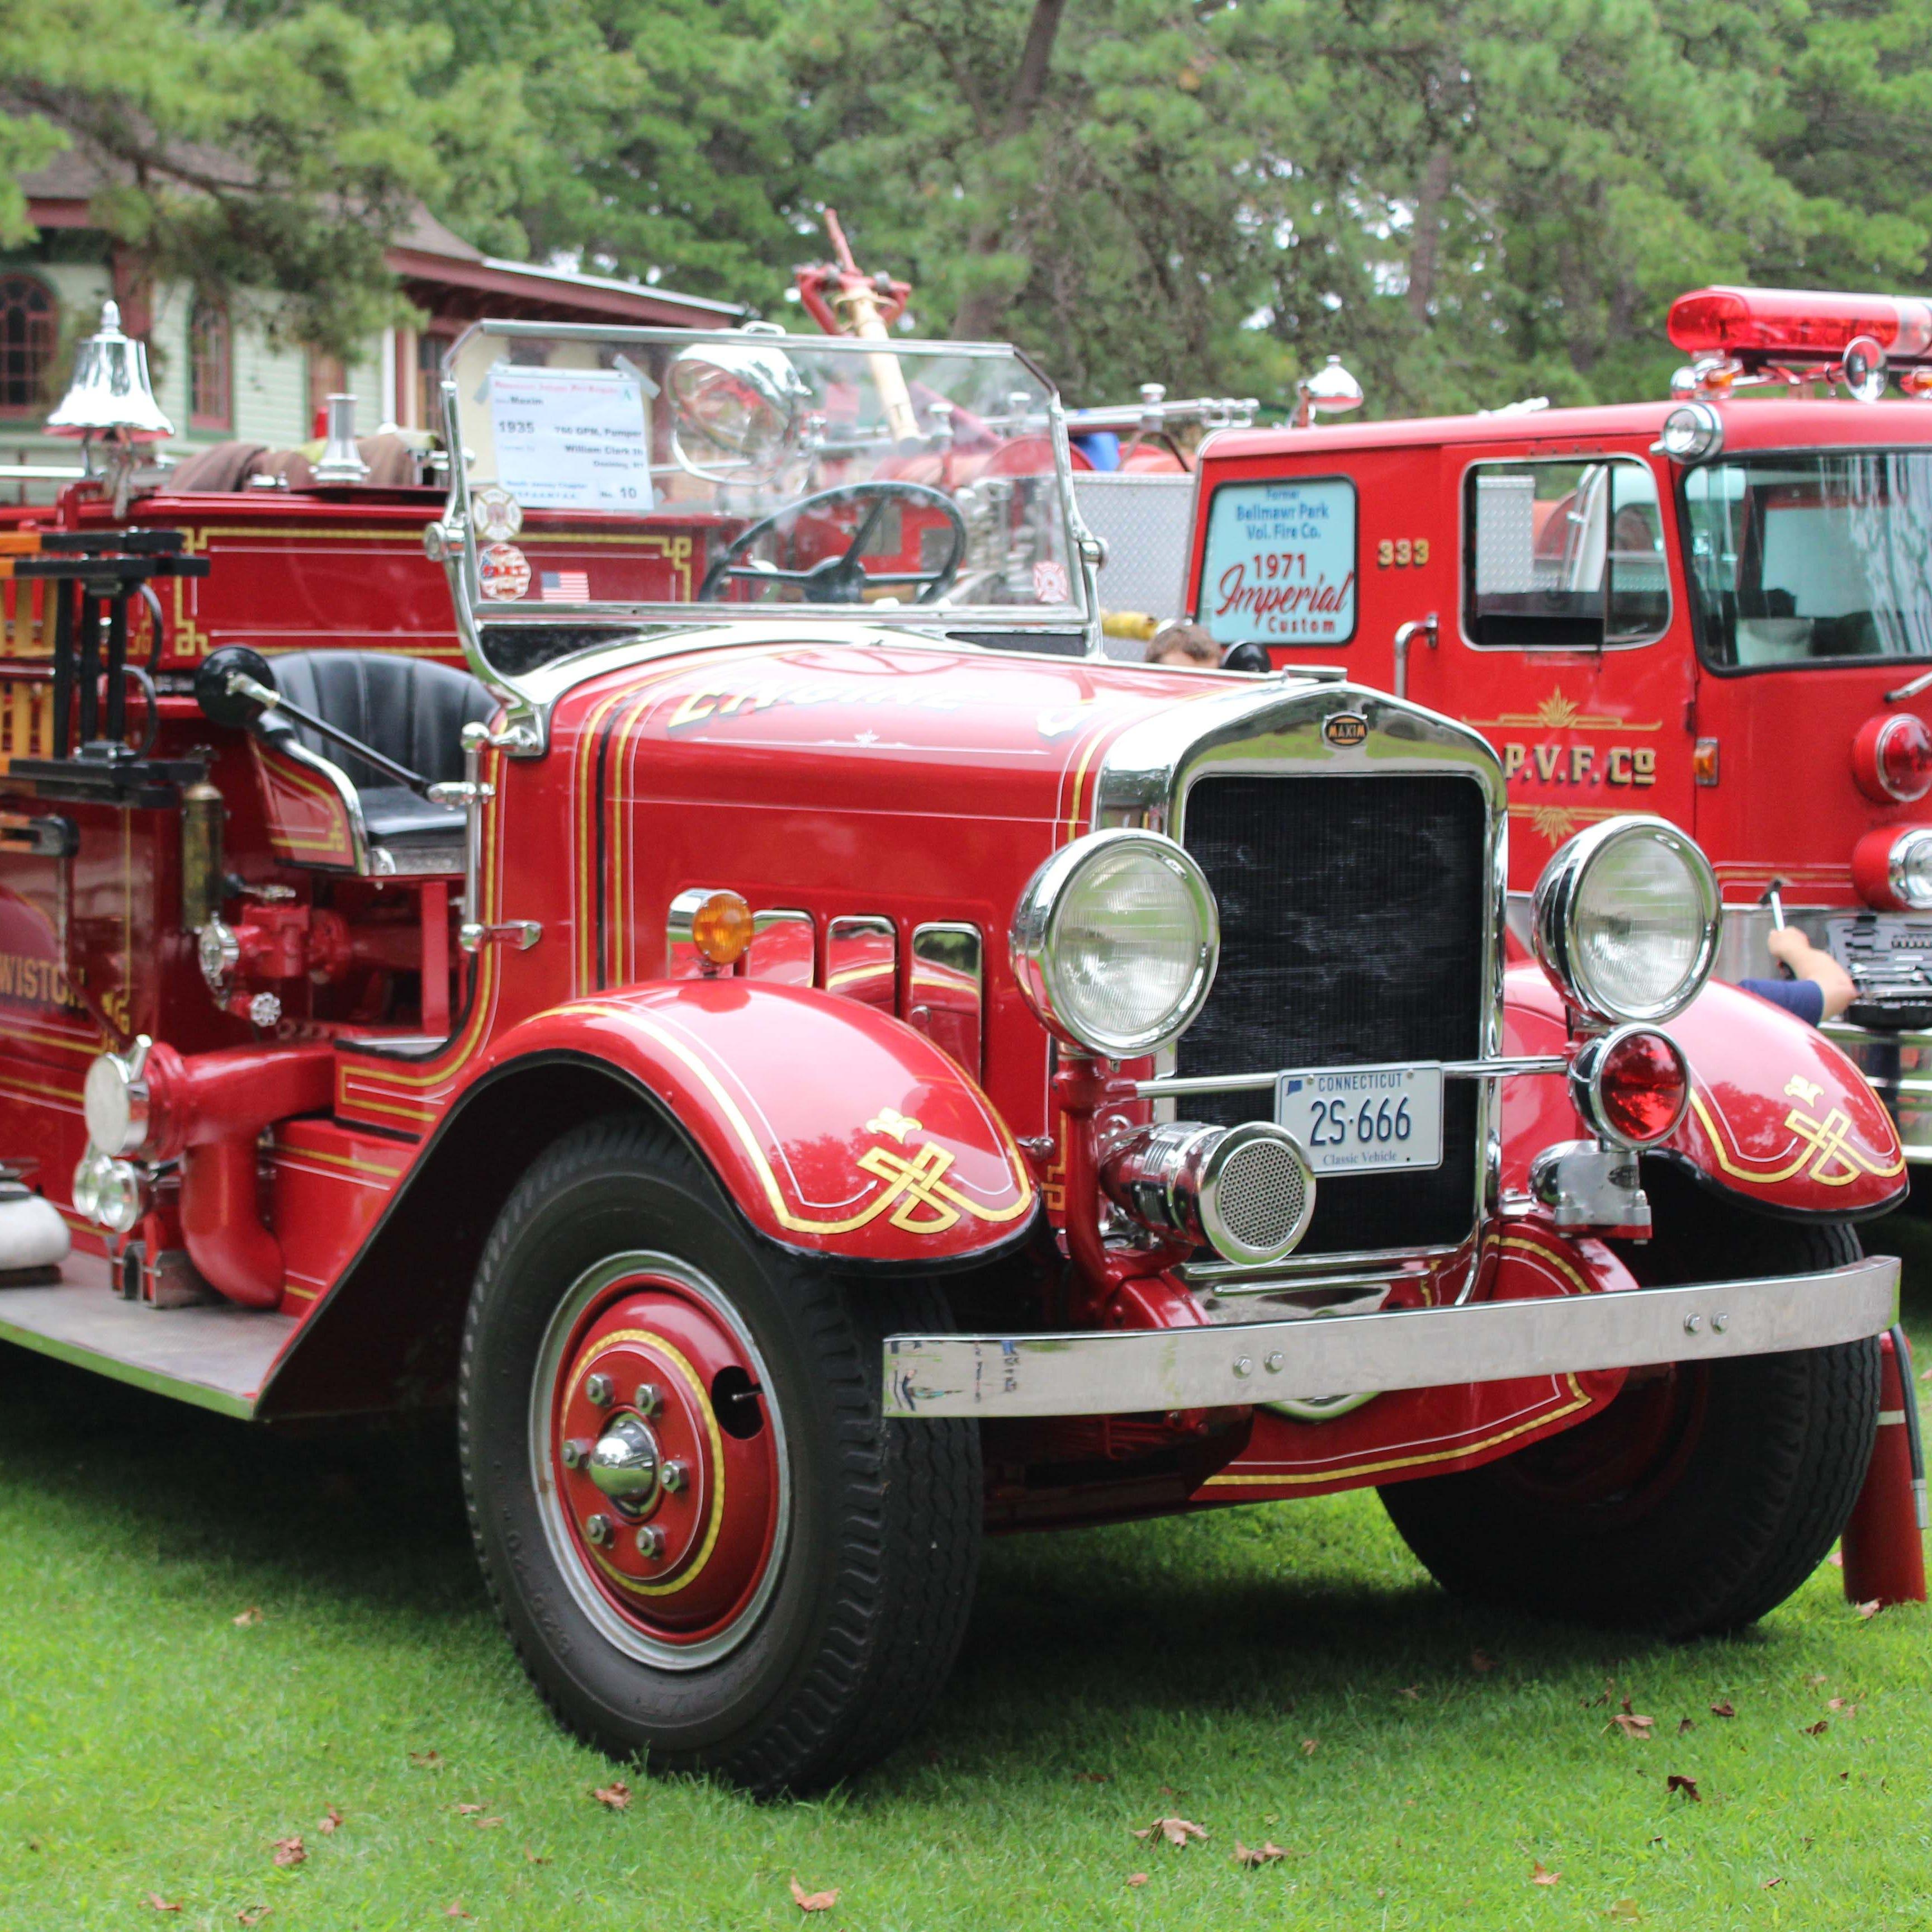 PHOTOS: Antique Fire Brigade at Wheaton Arts in Millville